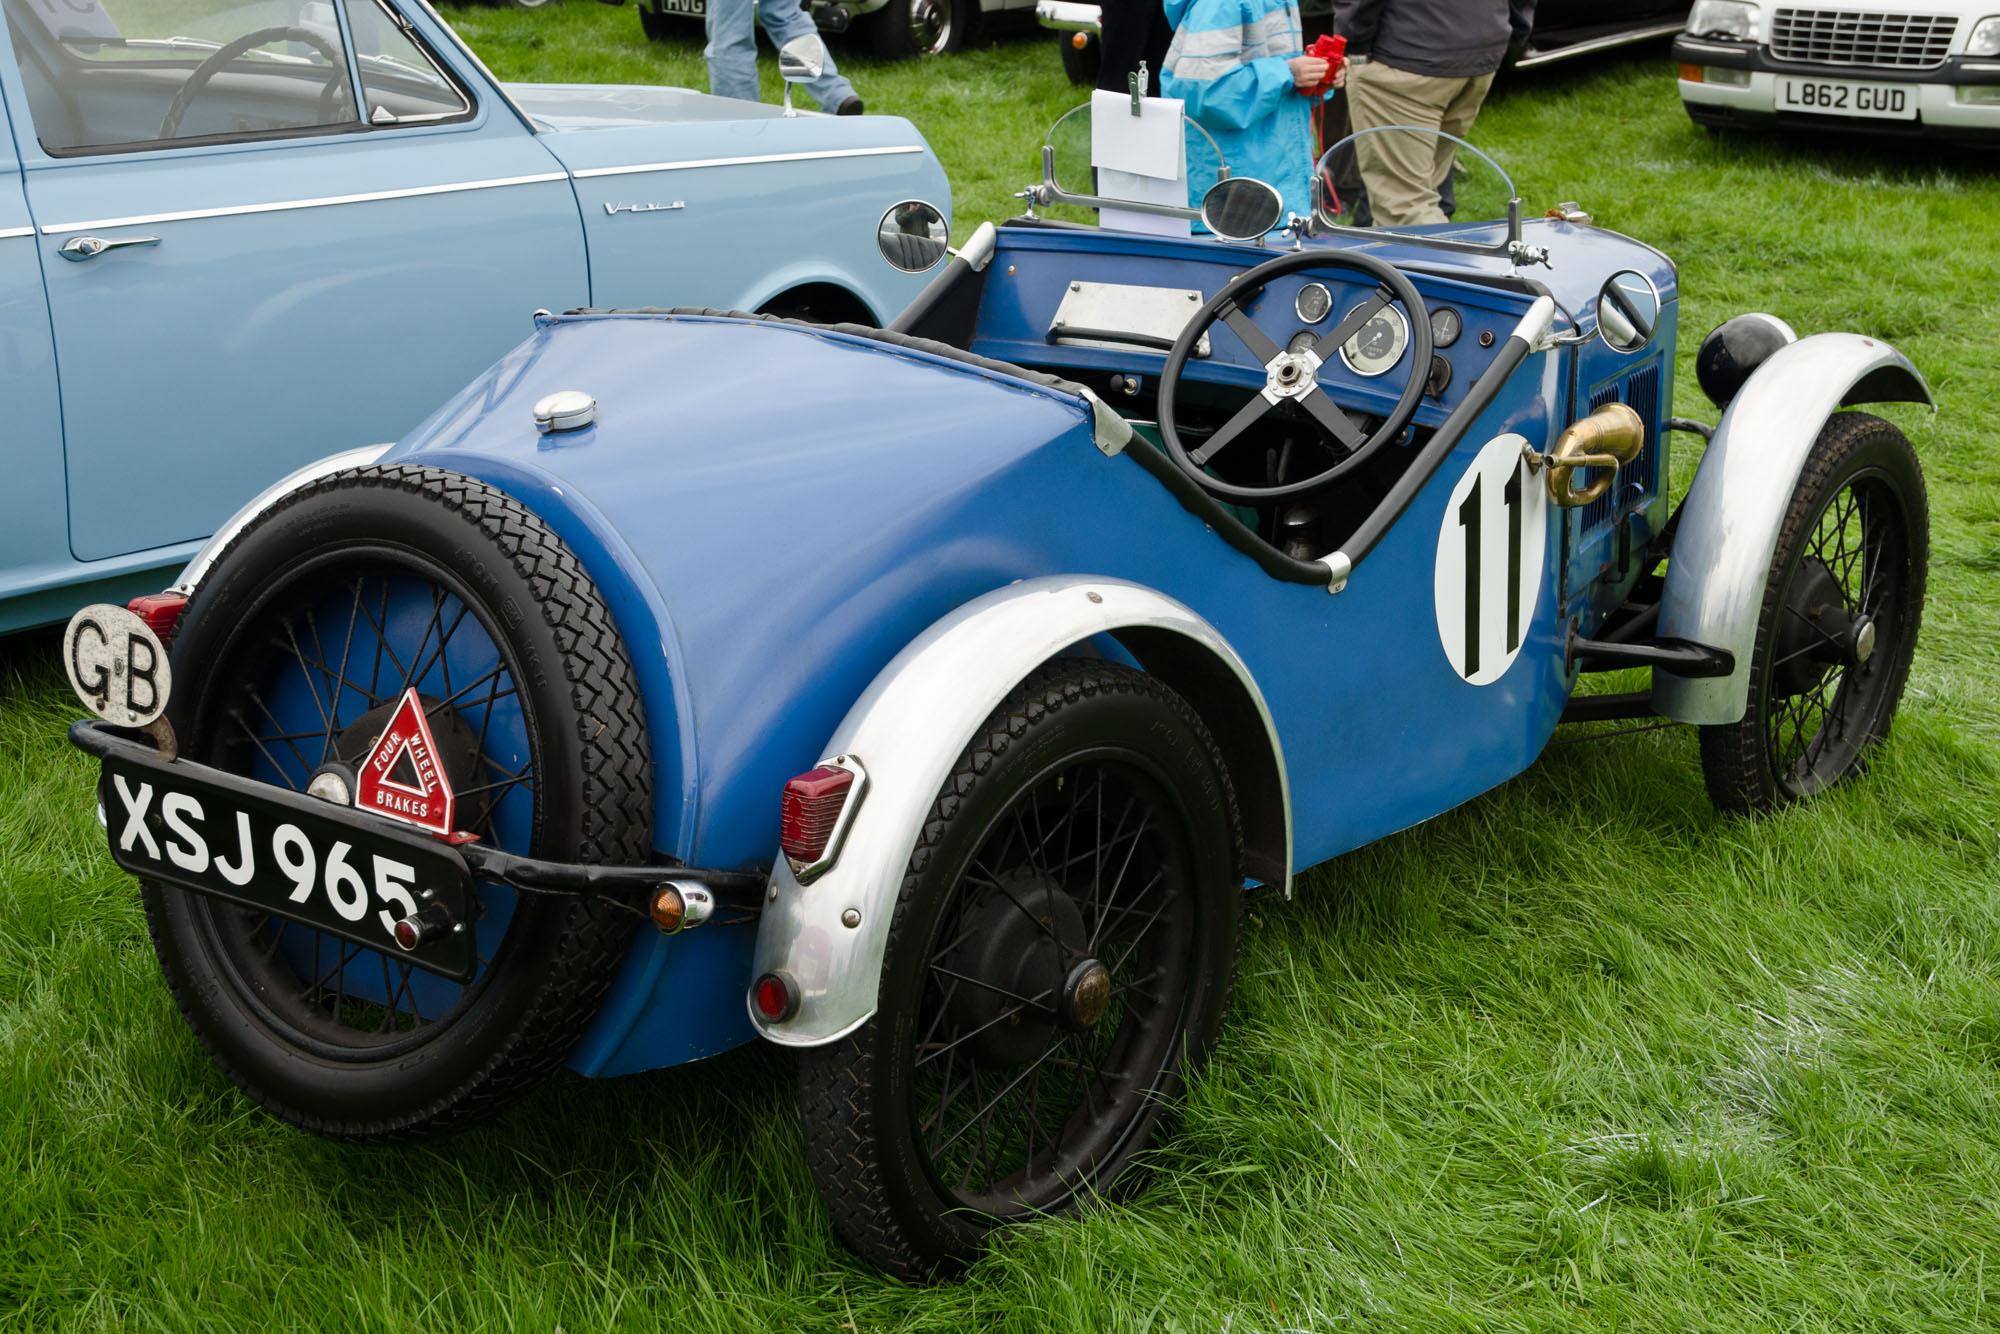 File:Austin 7 Special (1936) - 14282976631 jpg - Wikimedia